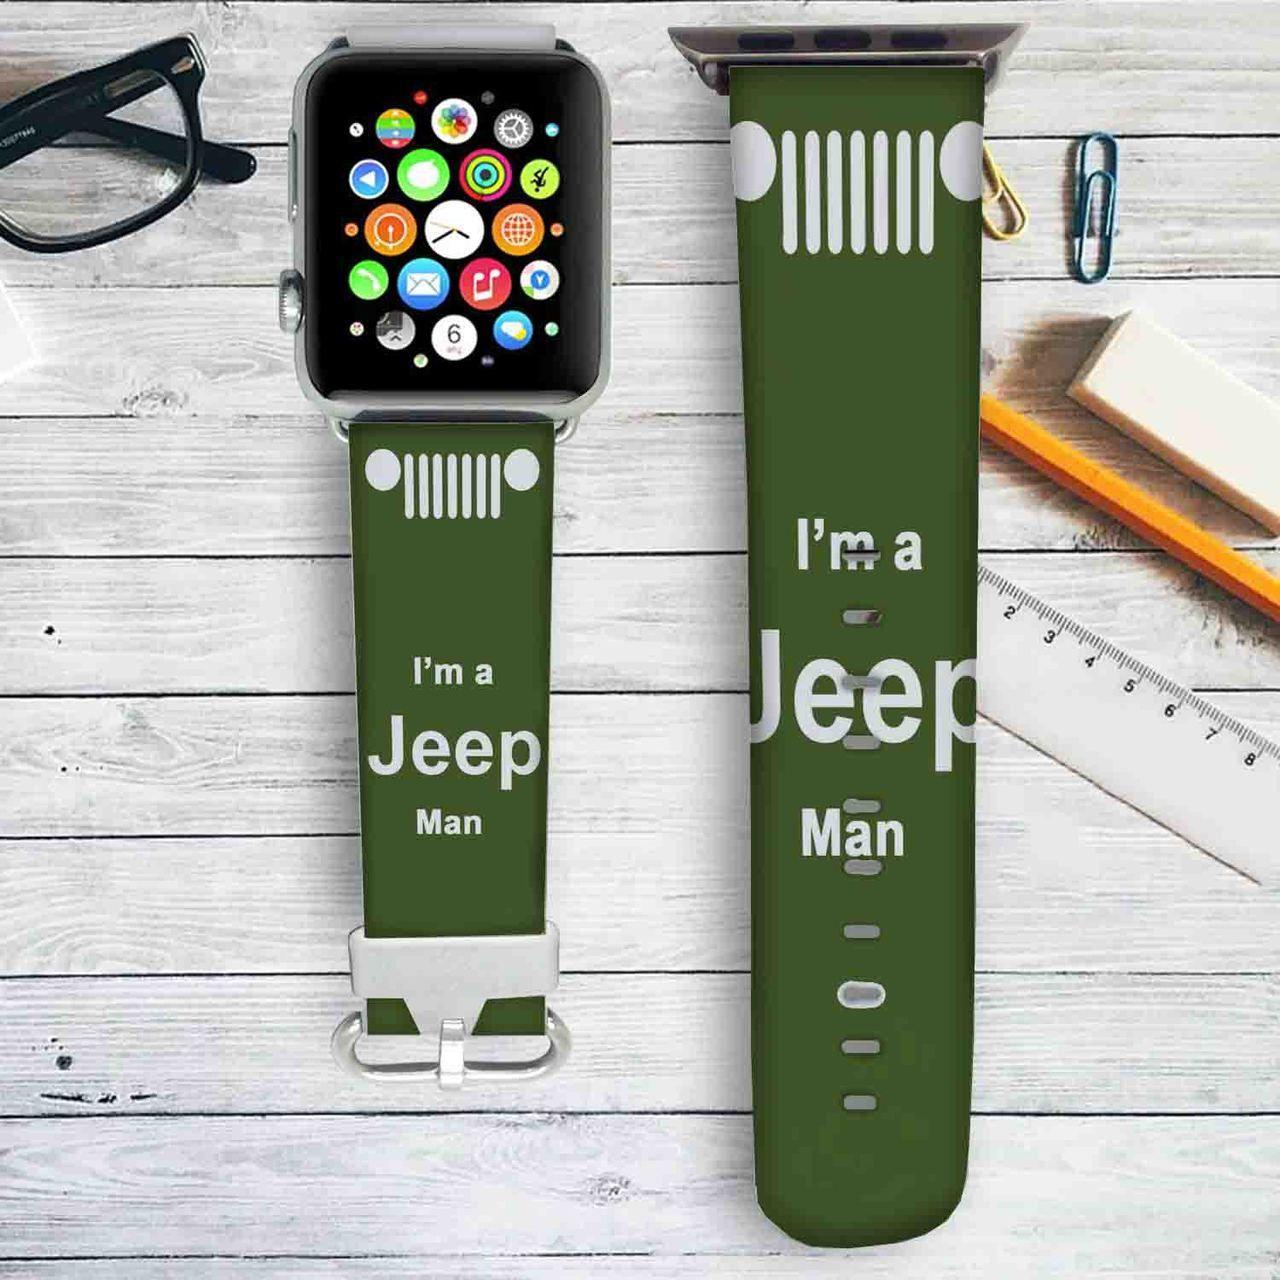 I'm a Jeep Man Custom Apple Watch Band Leather Strap Wrist